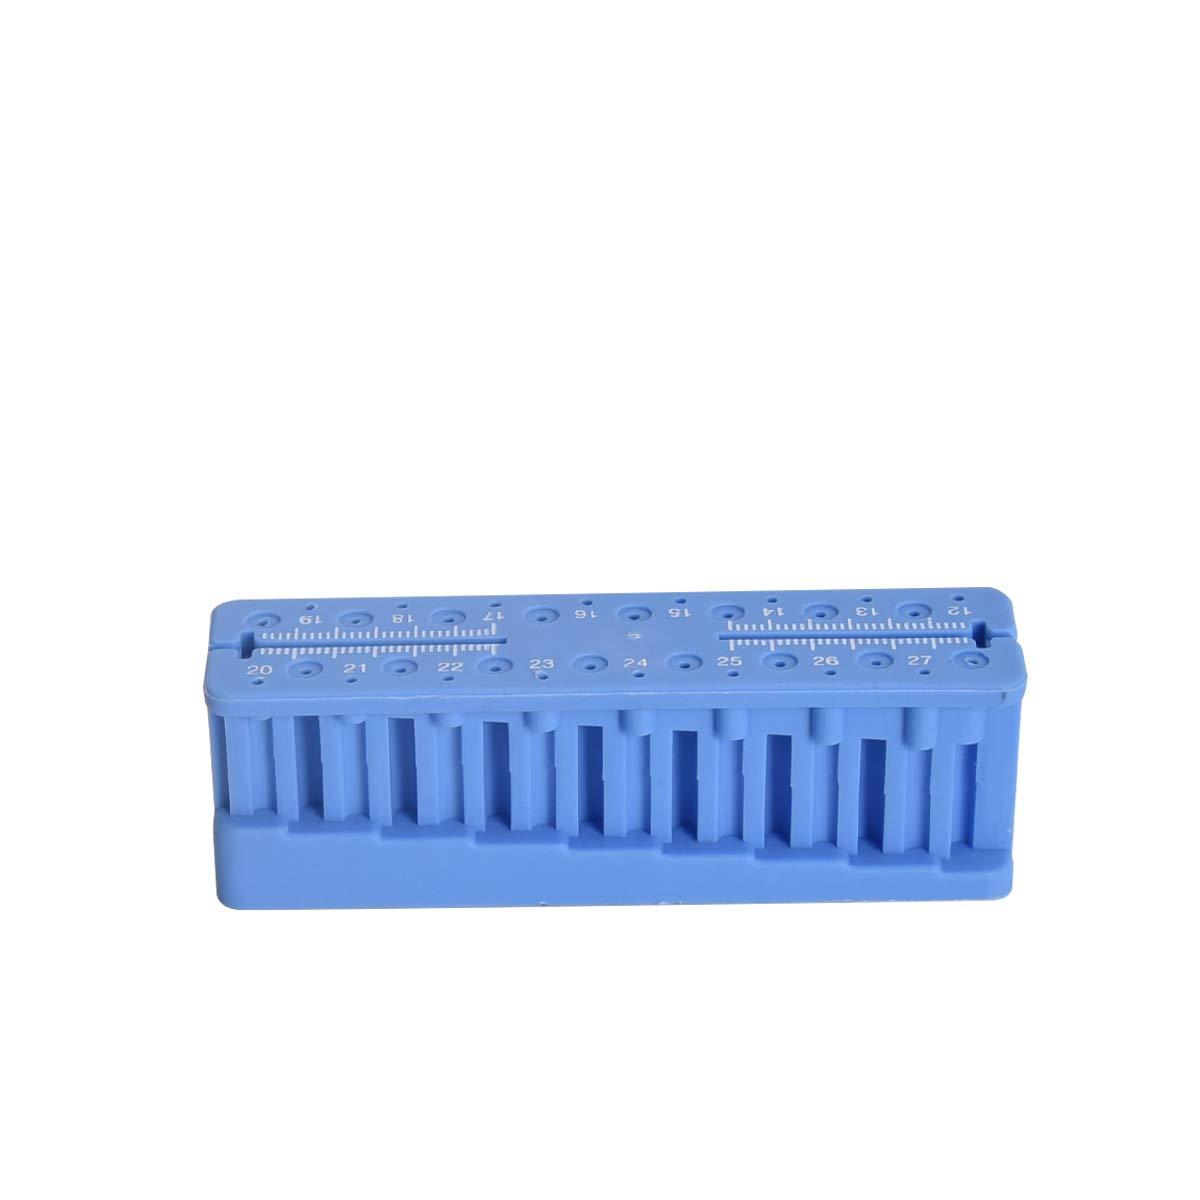 Anhuadental Dental Measuring Tools Holder Stand Autoclavable Endo Block File Ruler